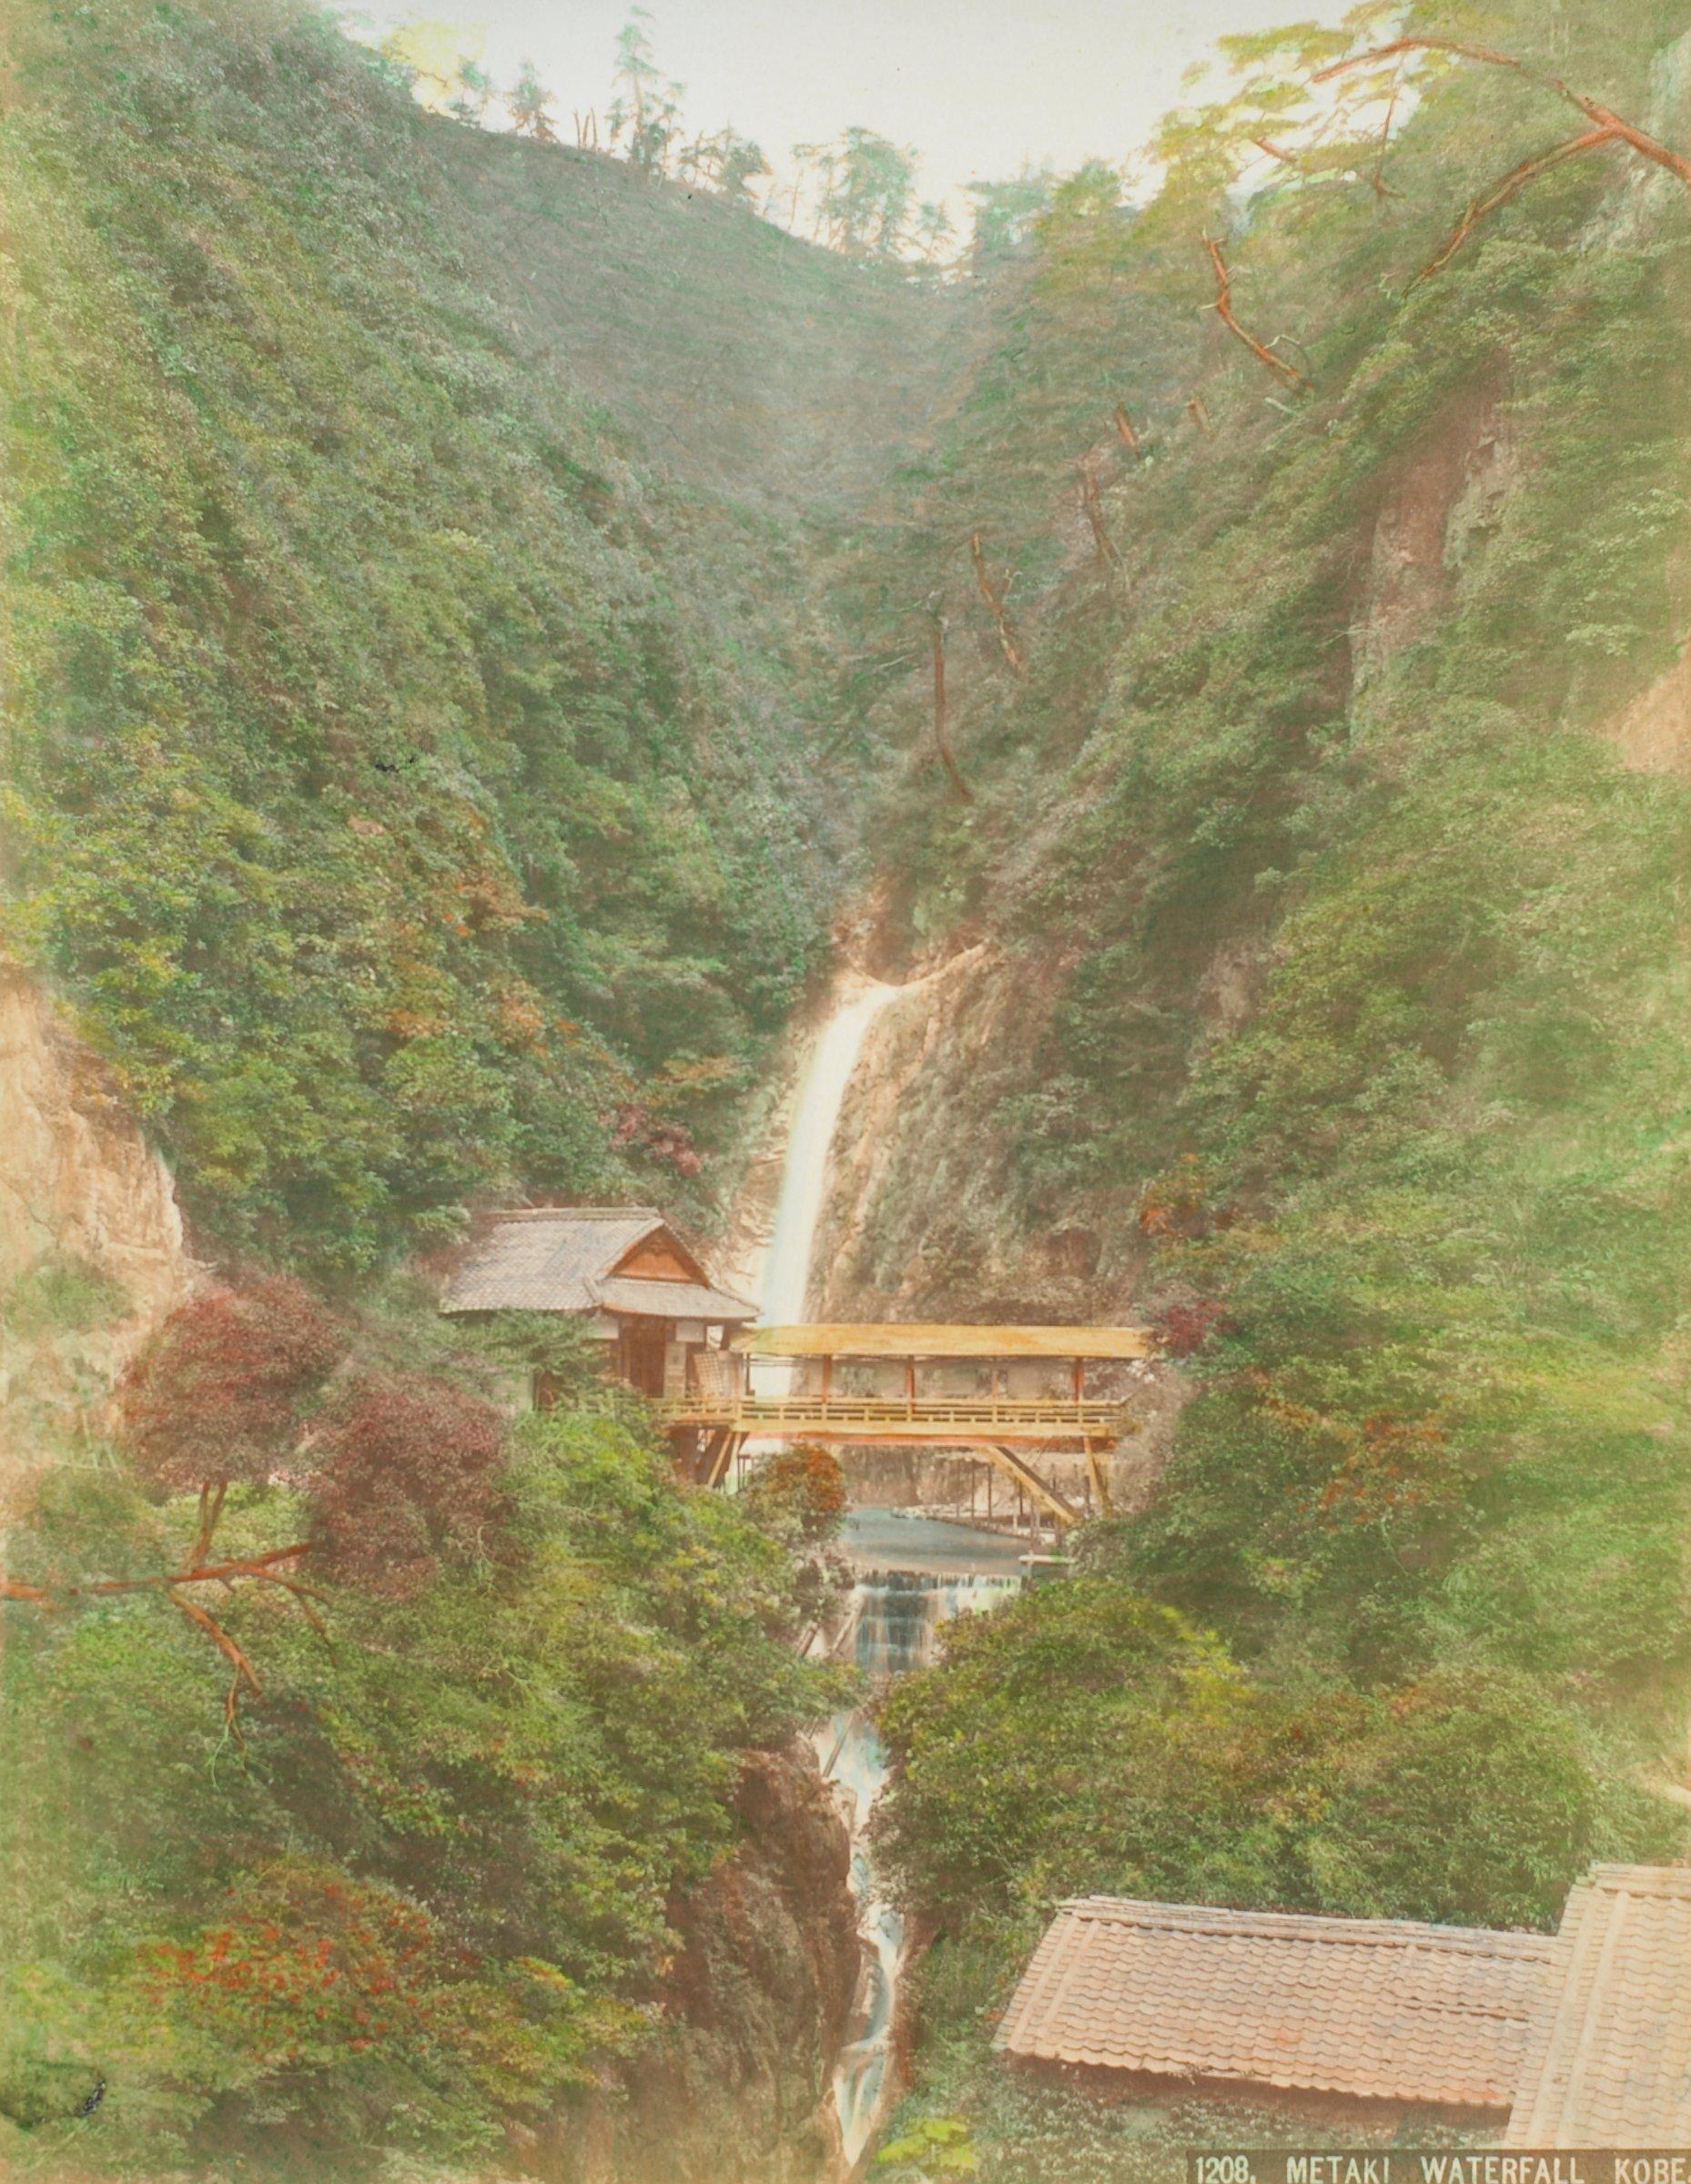 Metaki Waterfall Kobe (.46, recto); Arima Road (.47, verso), Attributed to Kusakabe Kimbei, hand-colored albumen prints mounted to album page